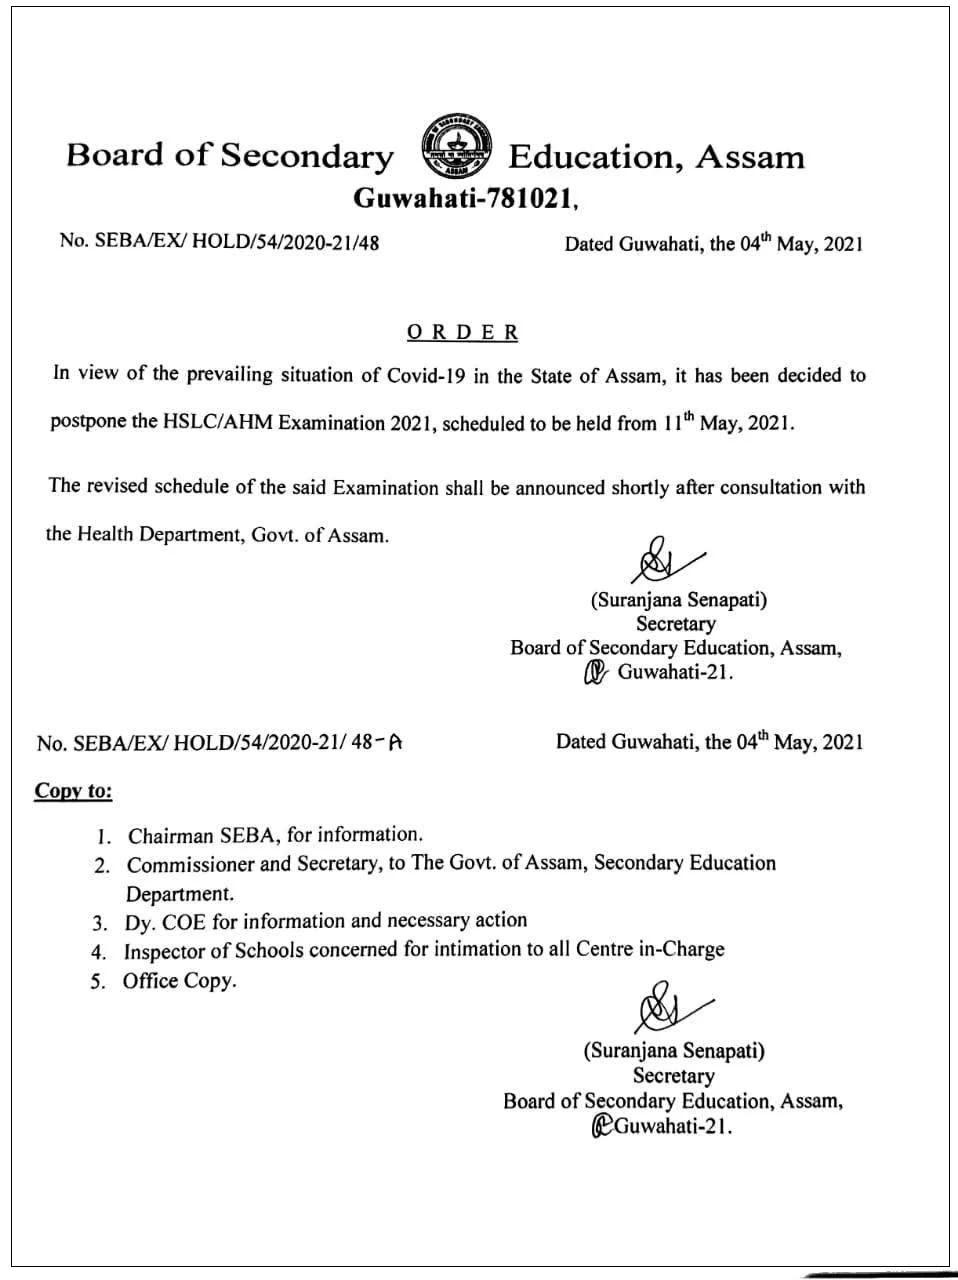 Assam HSLC Exam 2021 Postponed